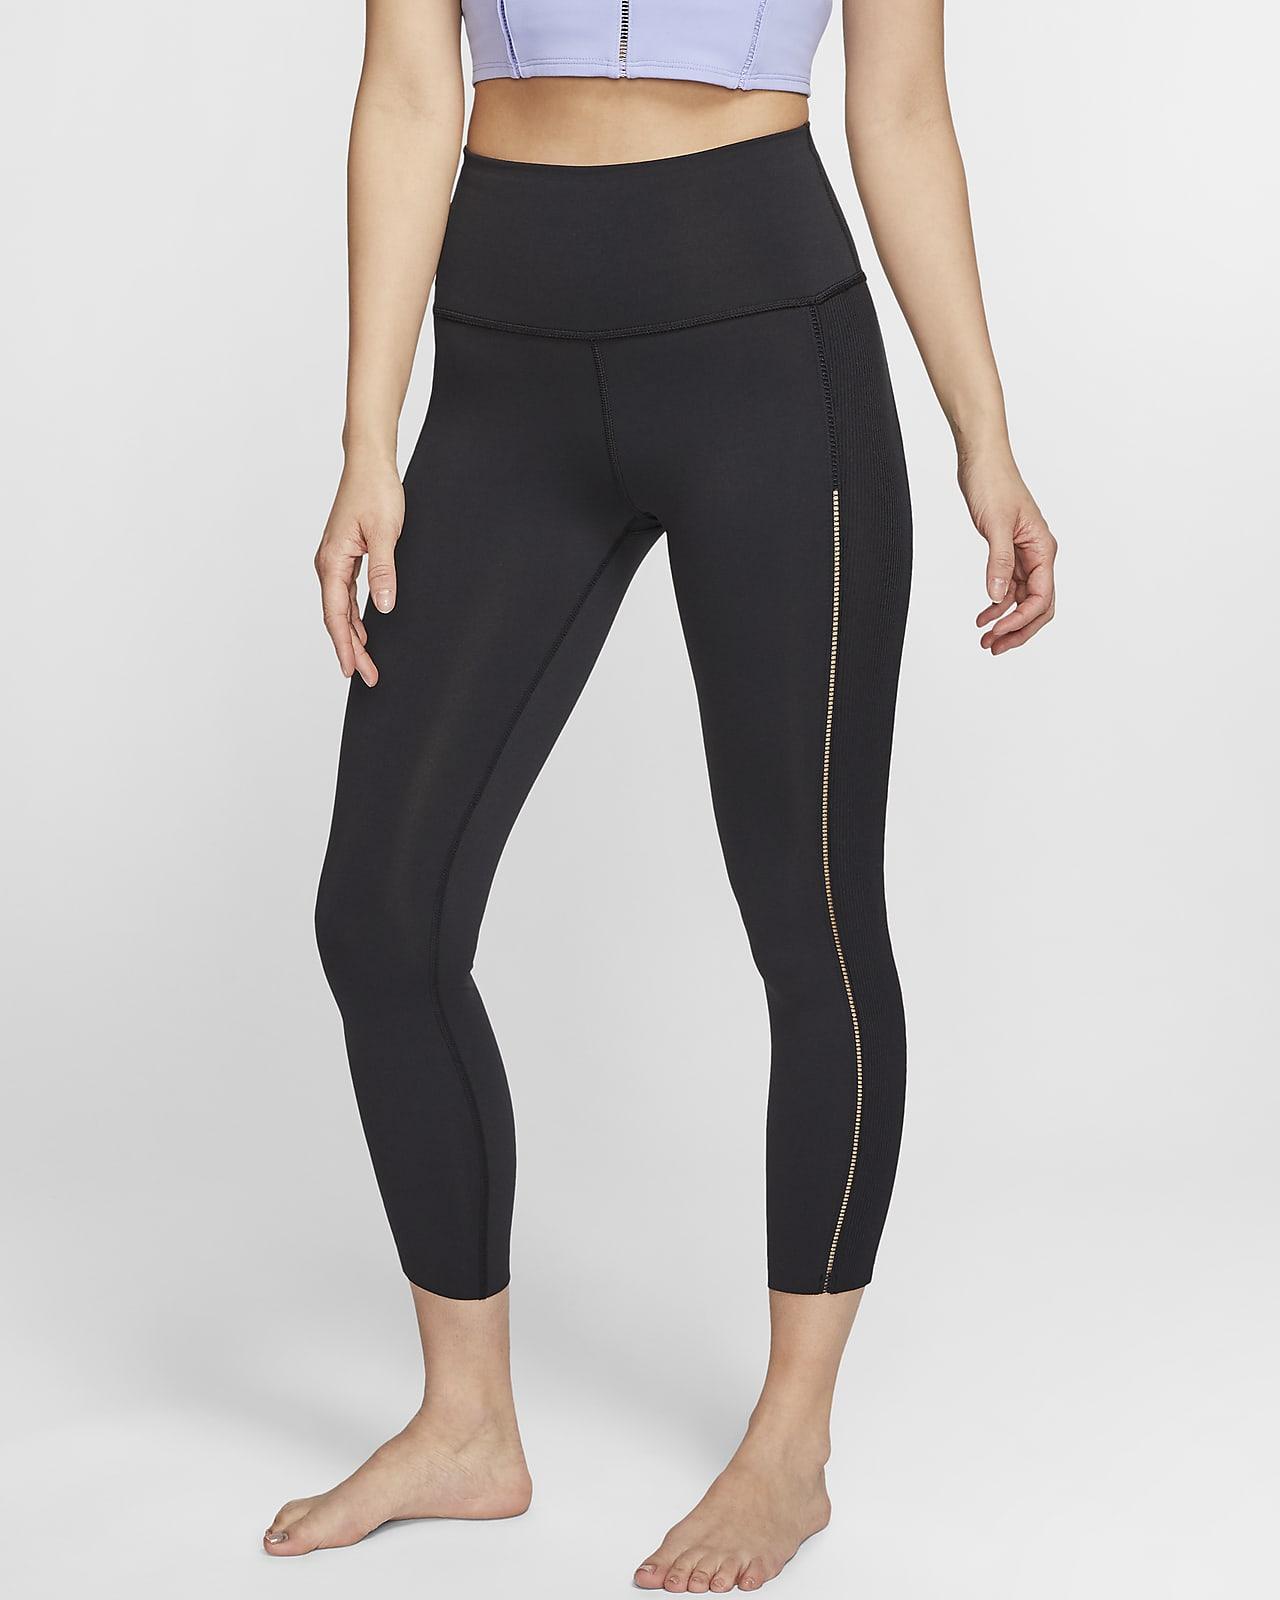 Nike Yoga Luxe Women's Infinalon 7/8 Ribbed Leggings